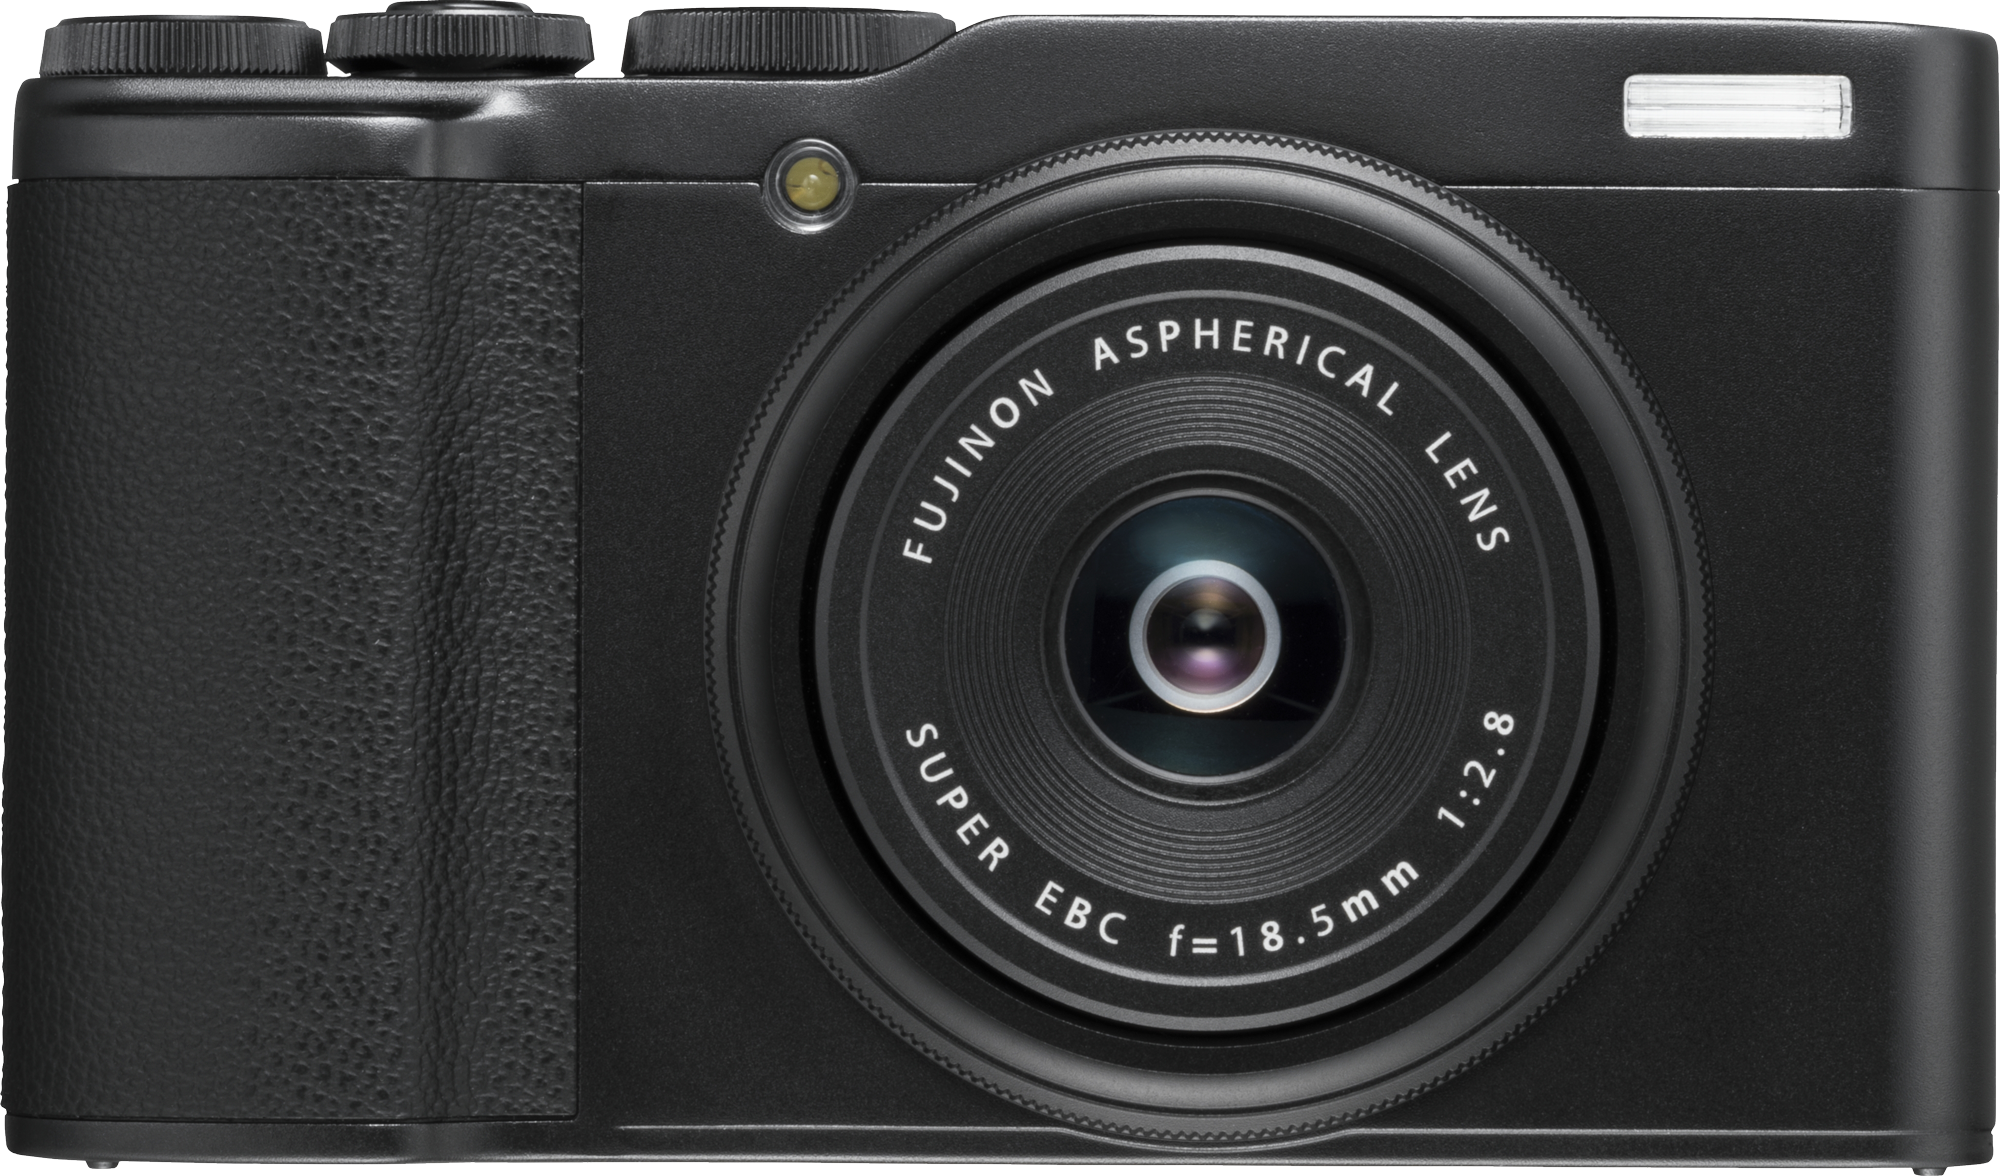 Fujifilm XF10: Digital Photography Review